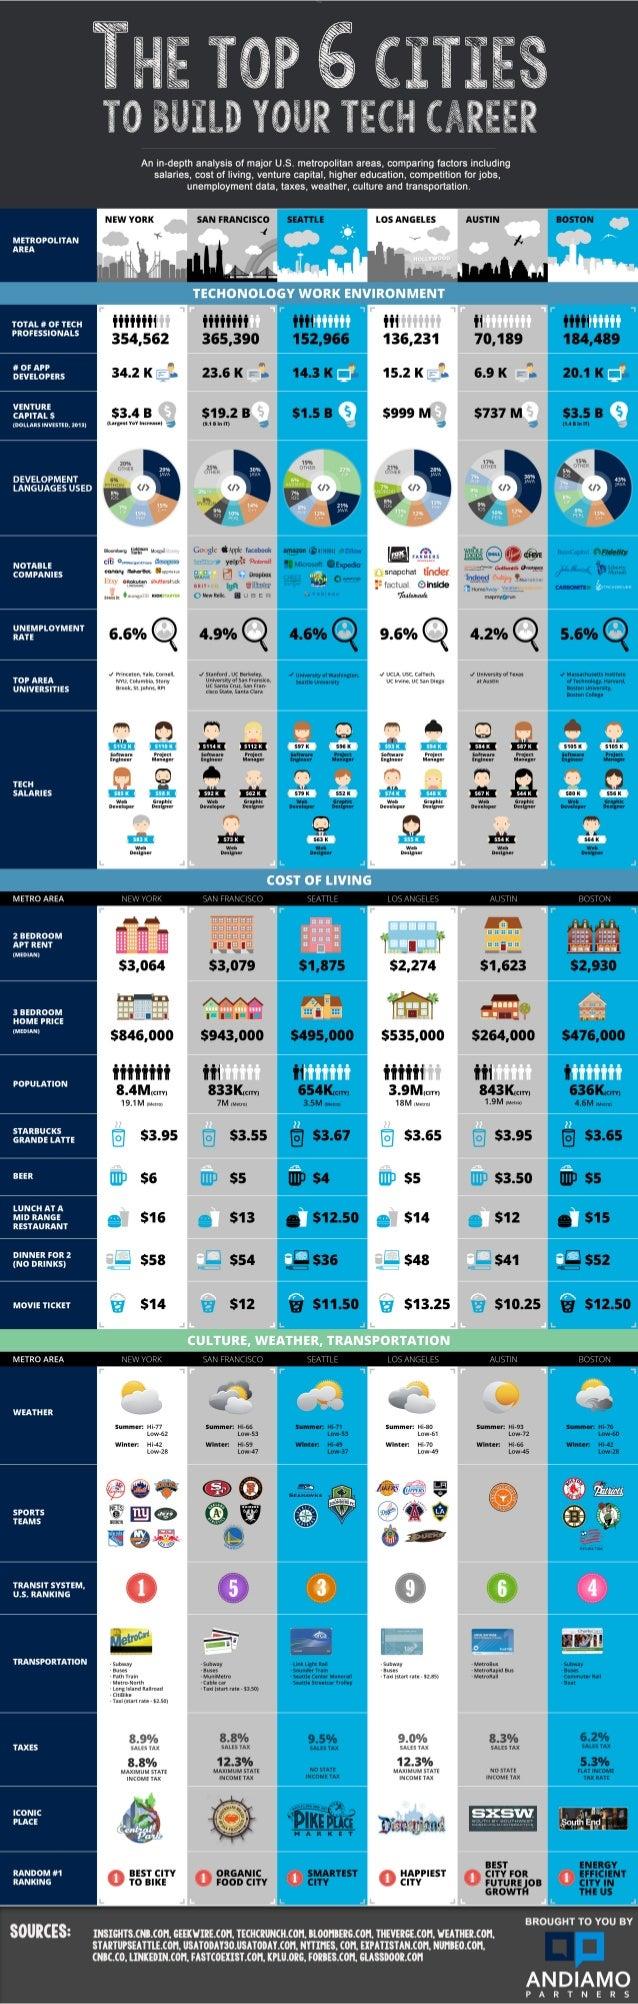 An in-depth analysis of major U. S. metropolitan areas,  comparing factors including salaries,  cost of living,  venture c...